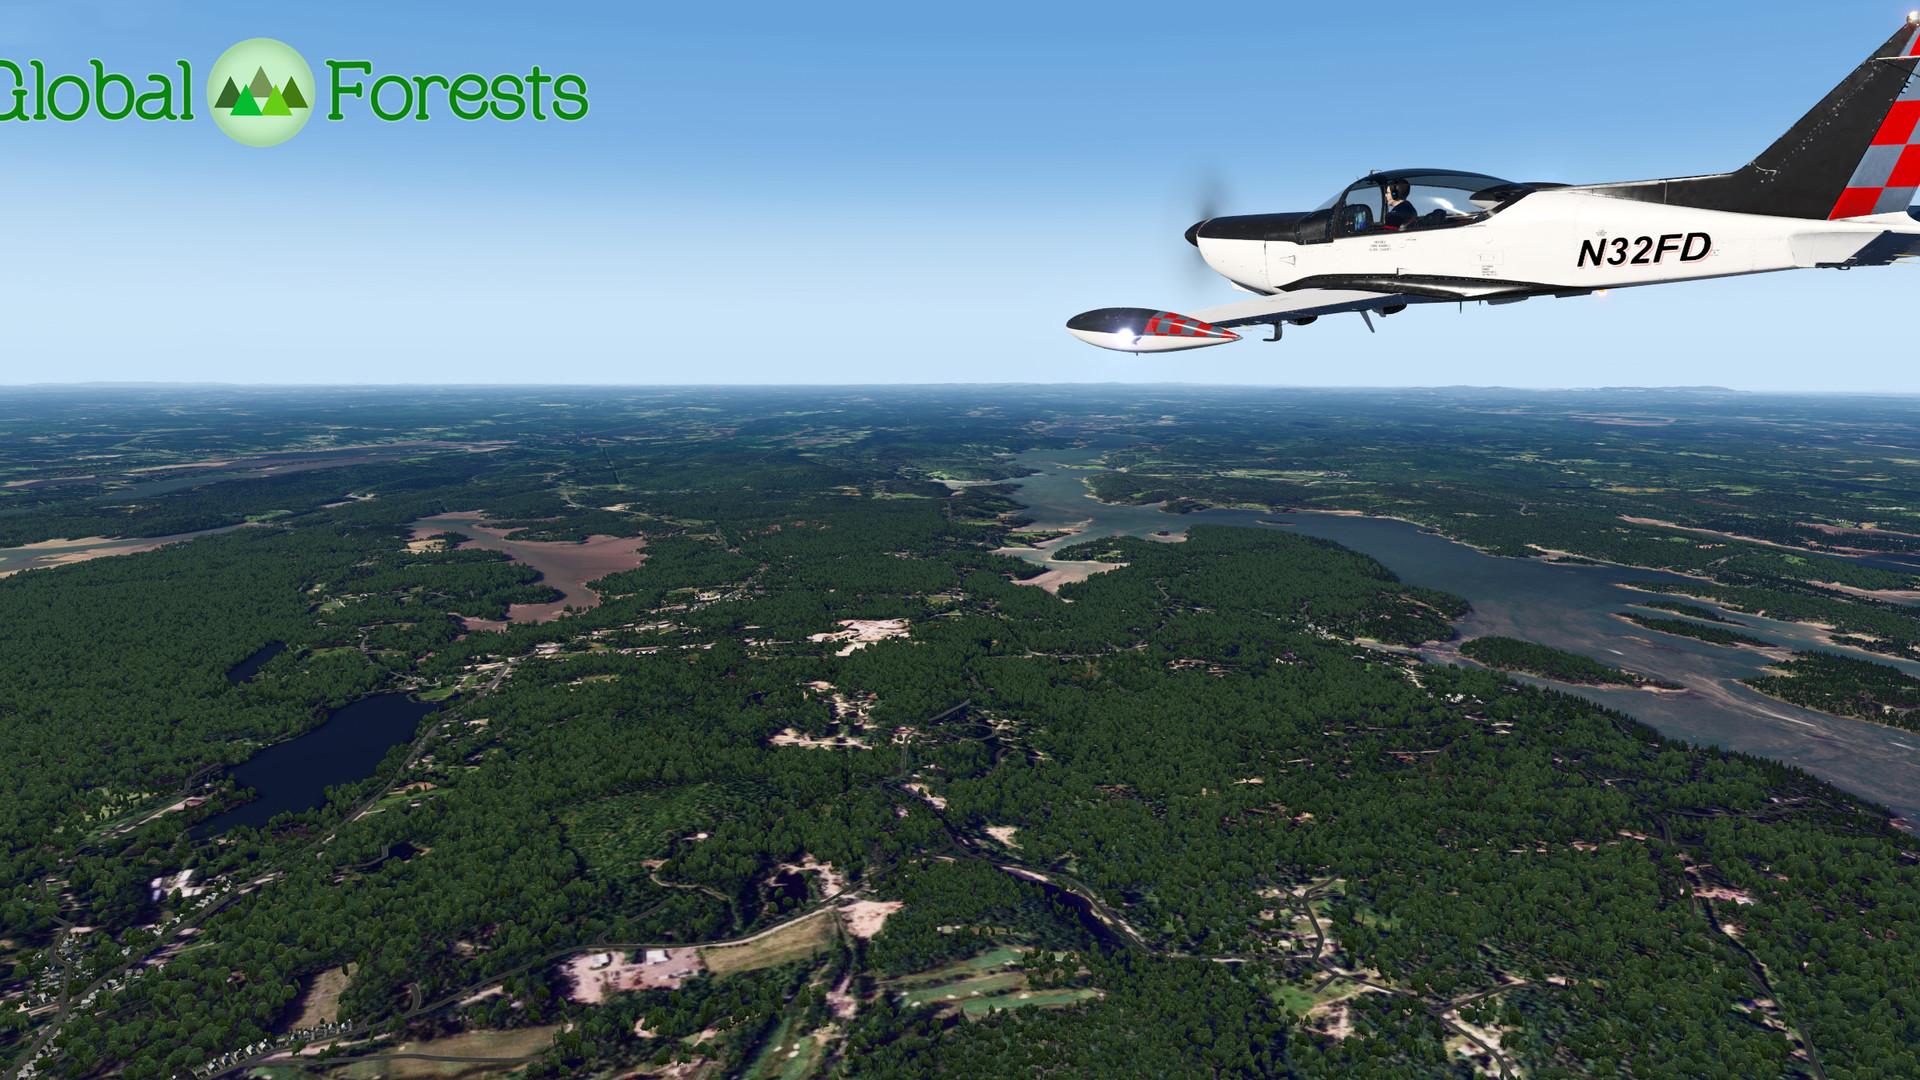 Global_Forests_USA.jpg